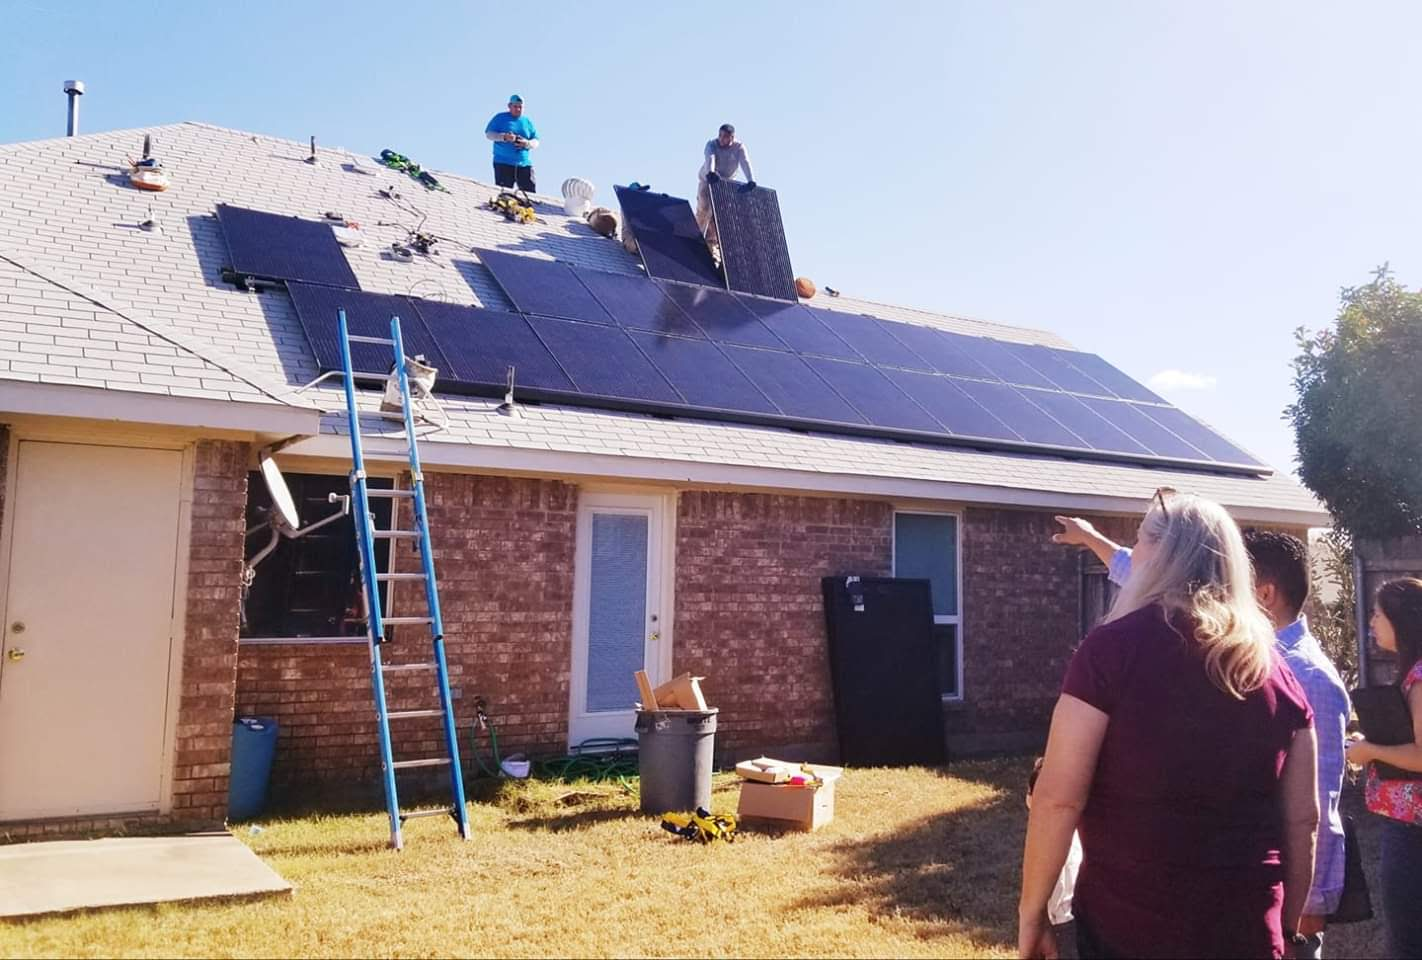 Sonovus energy residential solar array installation